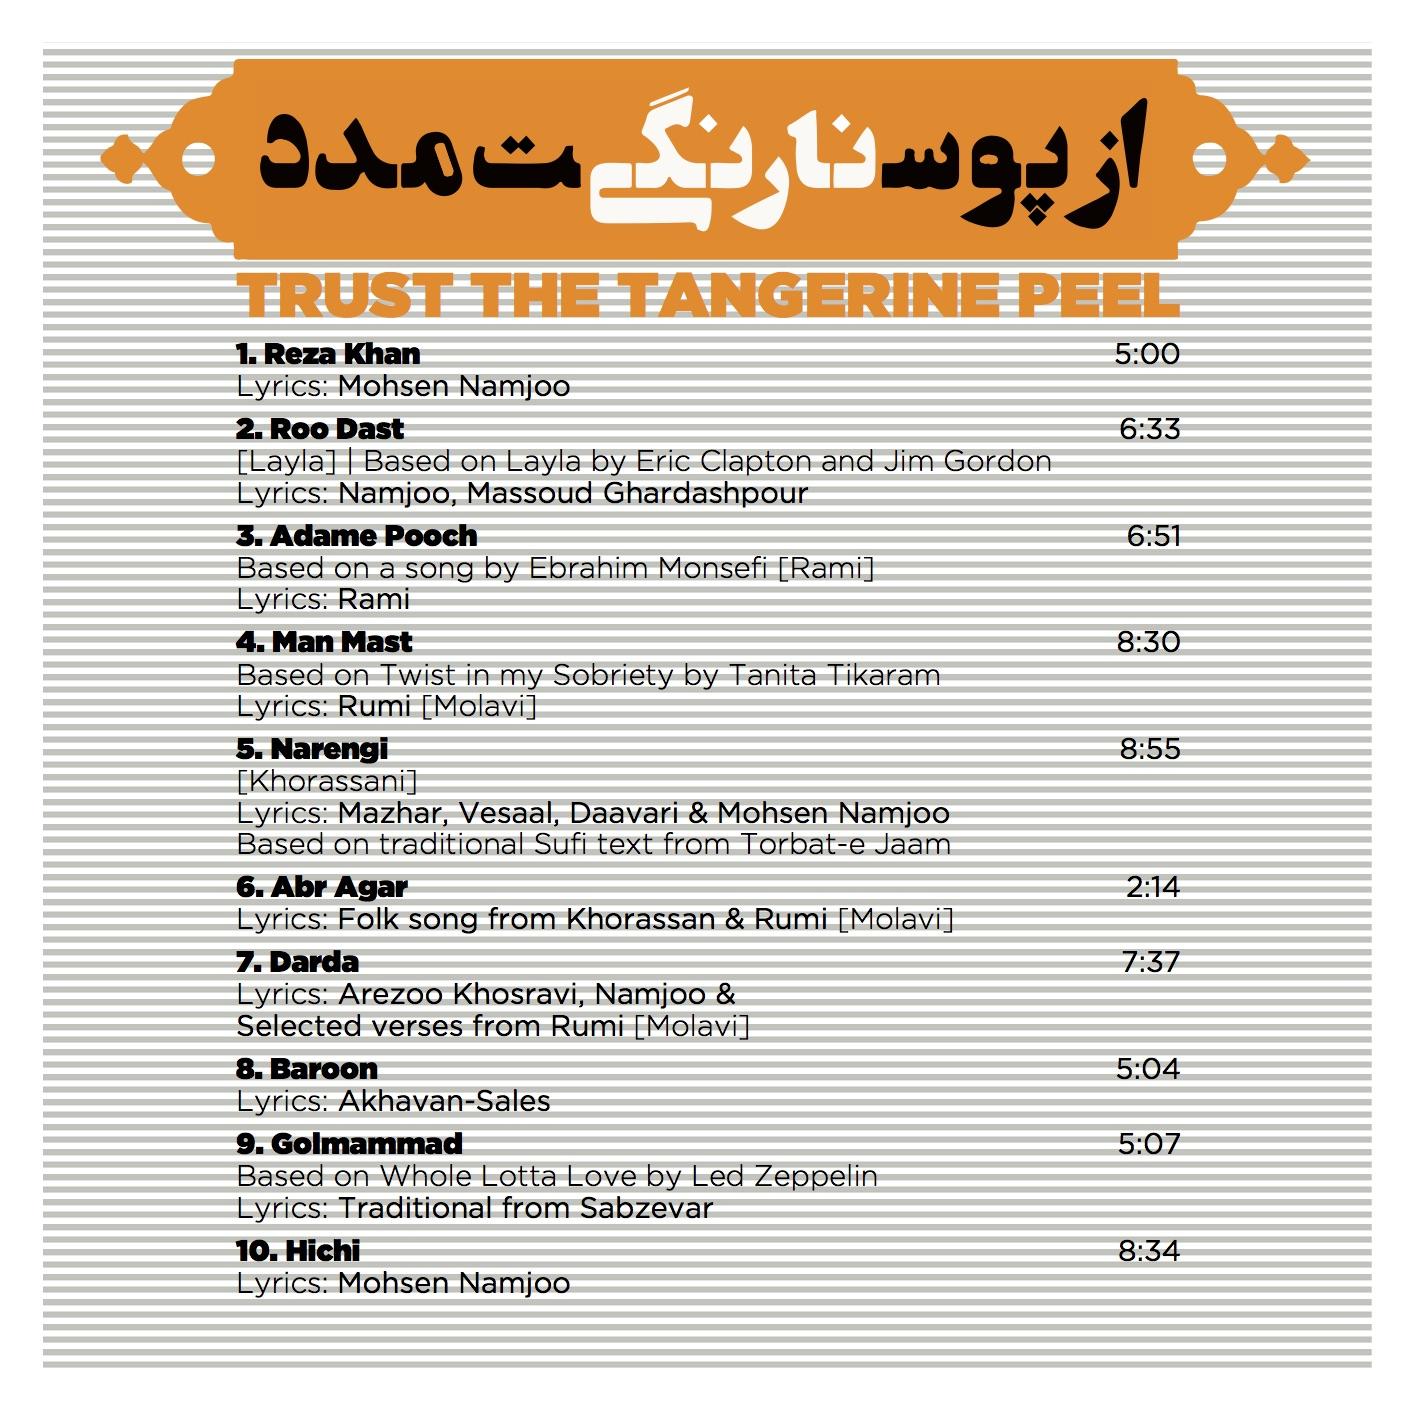 02-Trust the Tangerine Peel Final.jpg